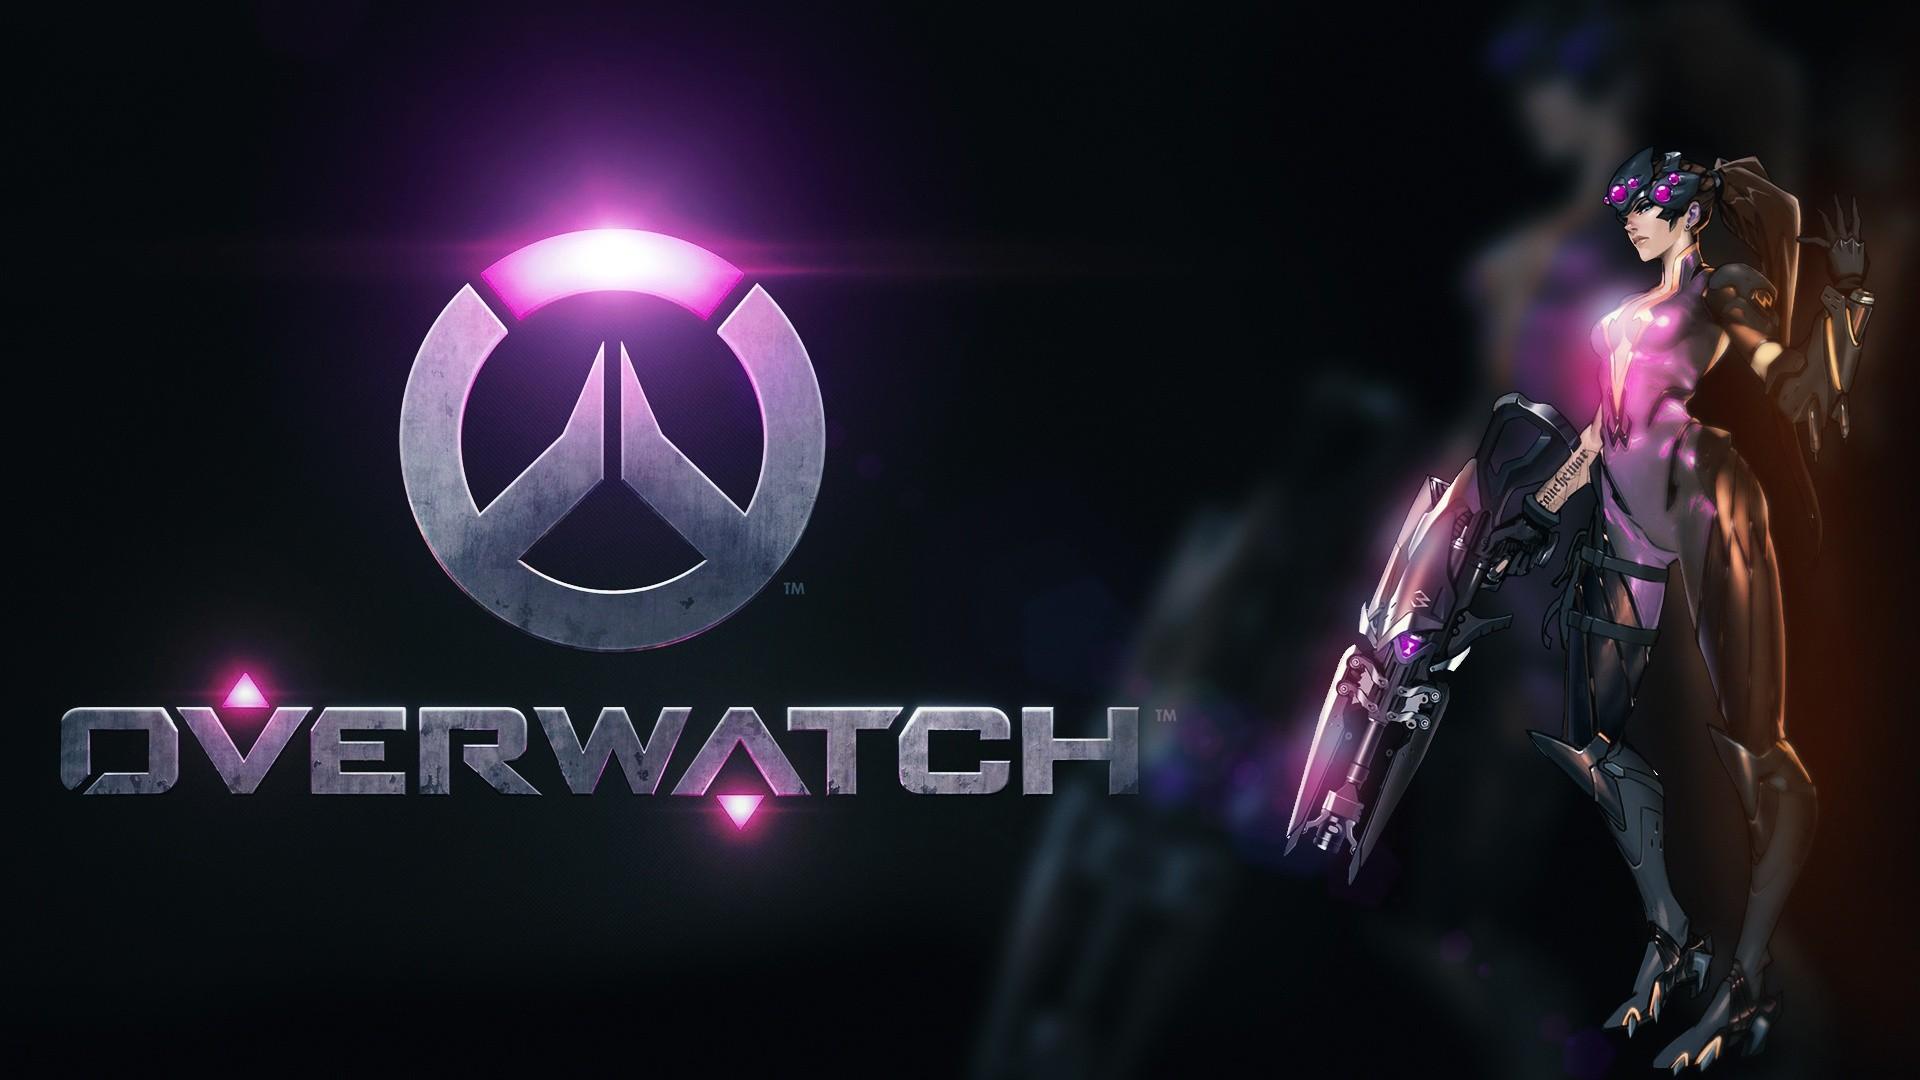 Overwatch Wallpaper HD ·① Download Free Beautiful HD